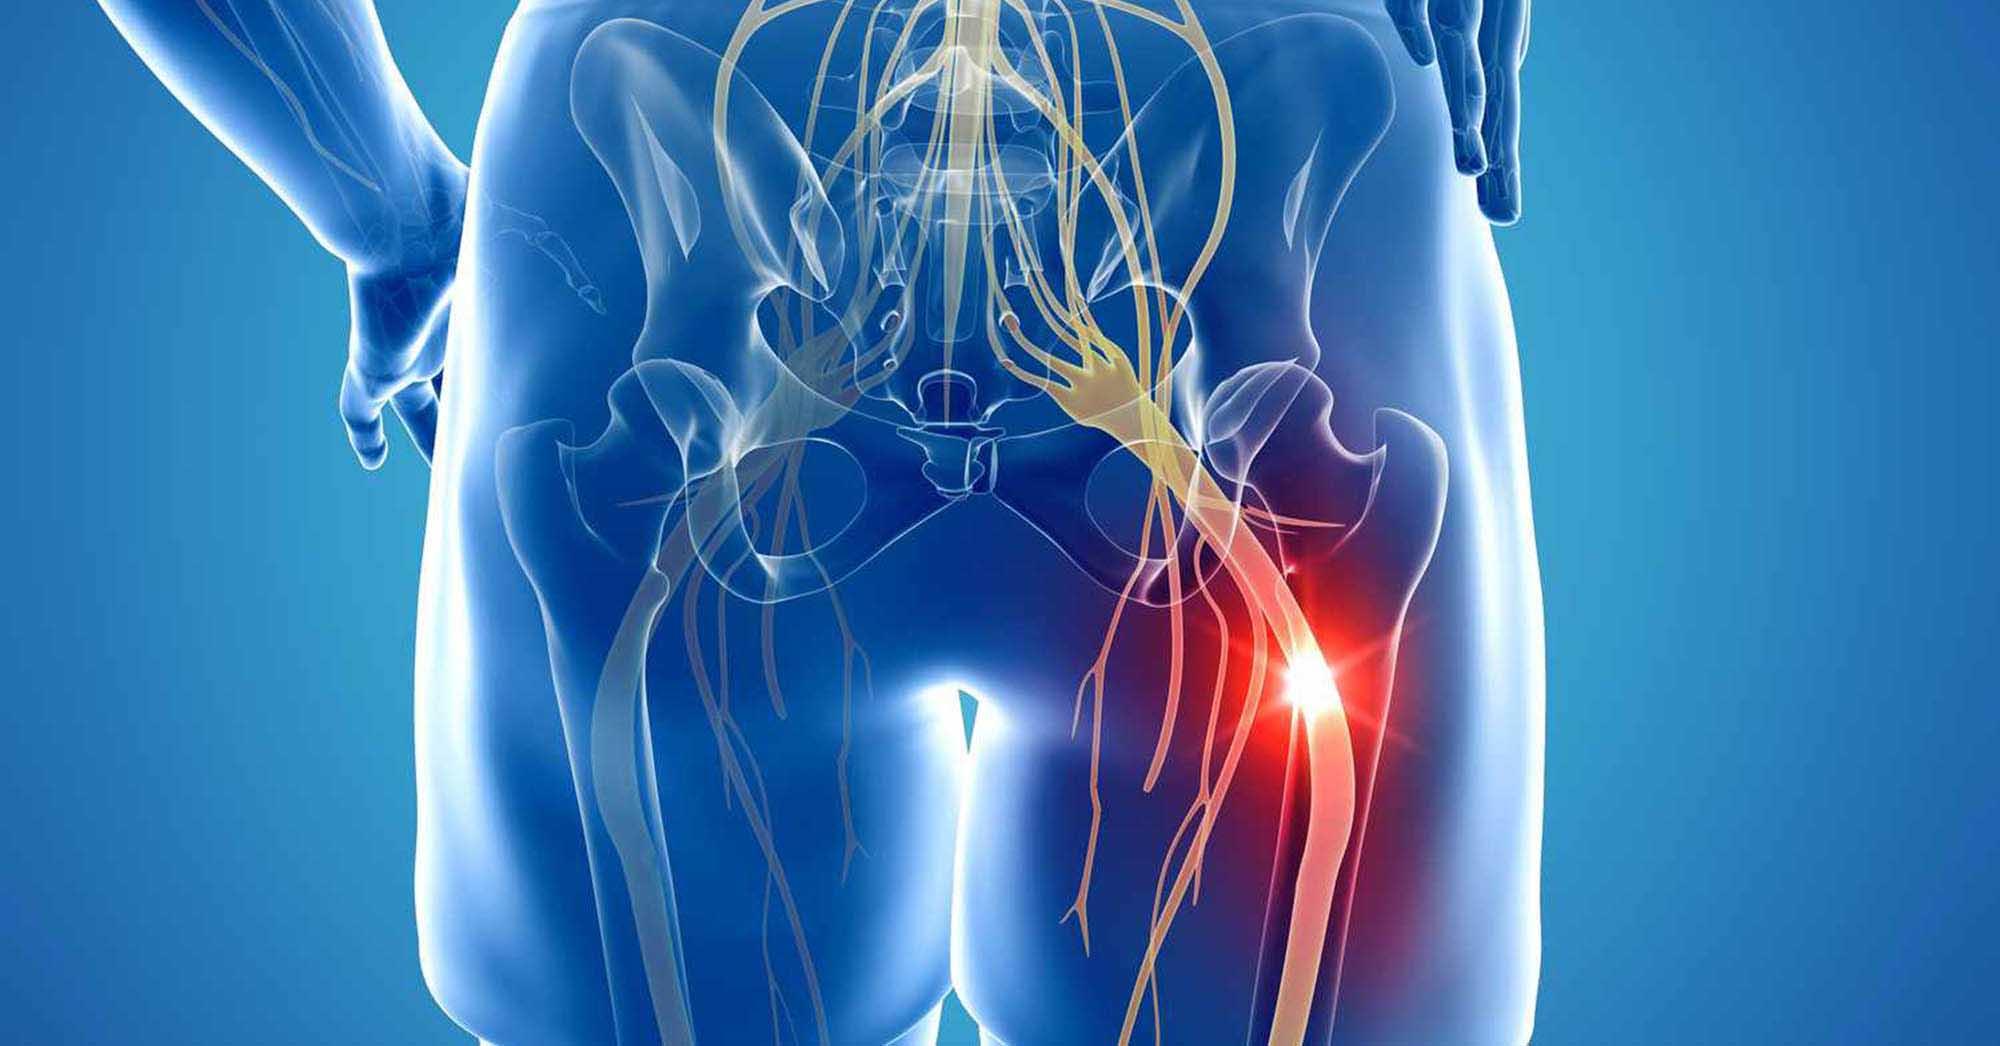 Illustration of a painful sciatica and spondylolisthesis pain